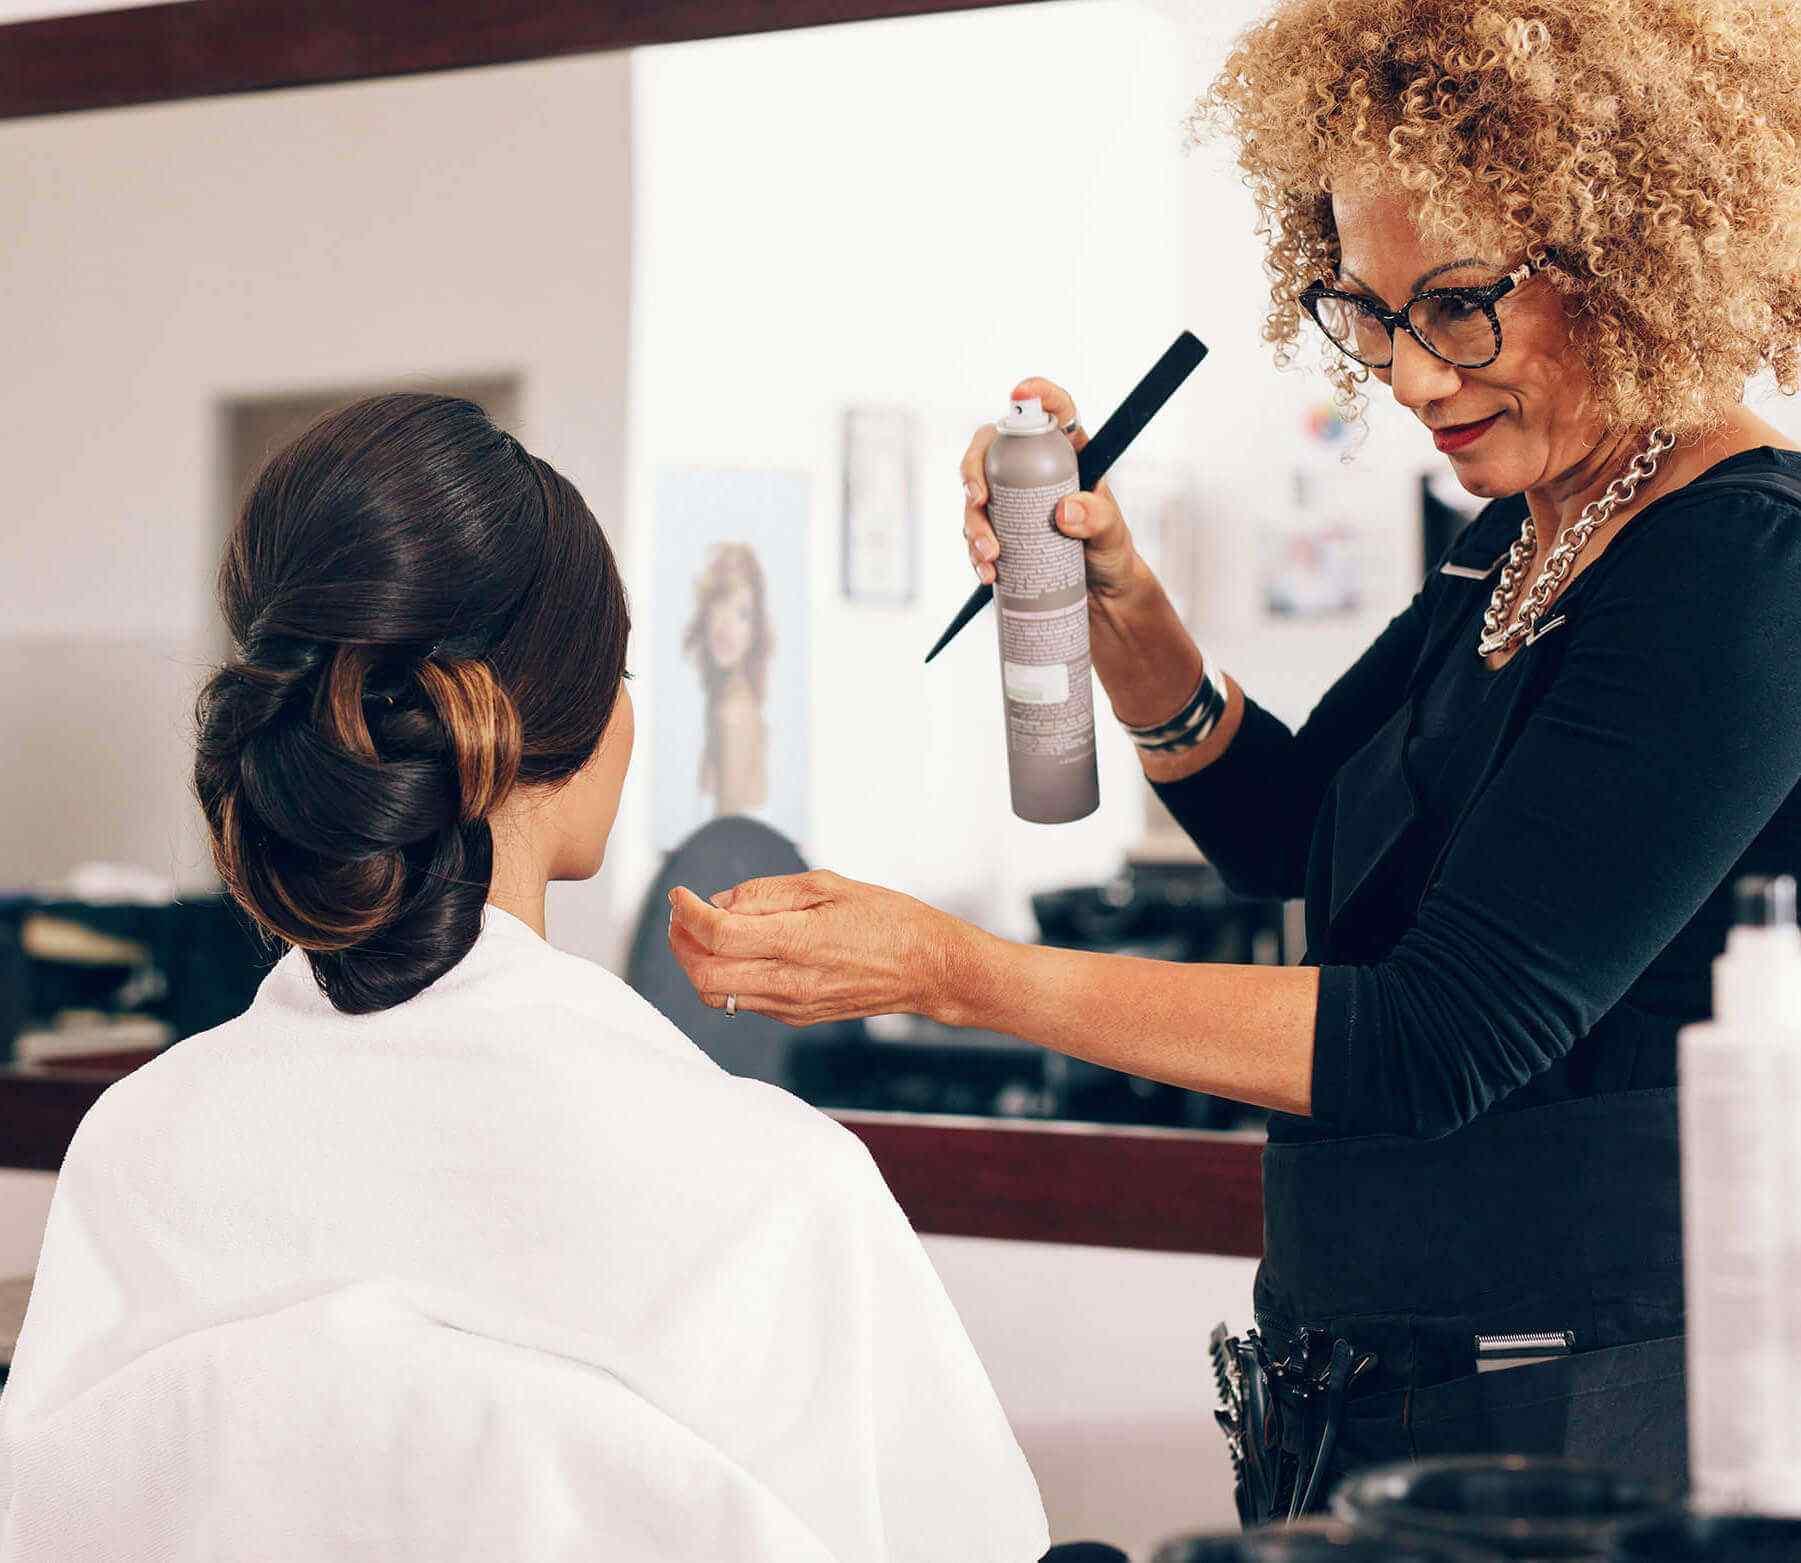 https://coiffurelaplace.fr/wp-content/uploads/2018/12/hairdresser-img-small.jpg